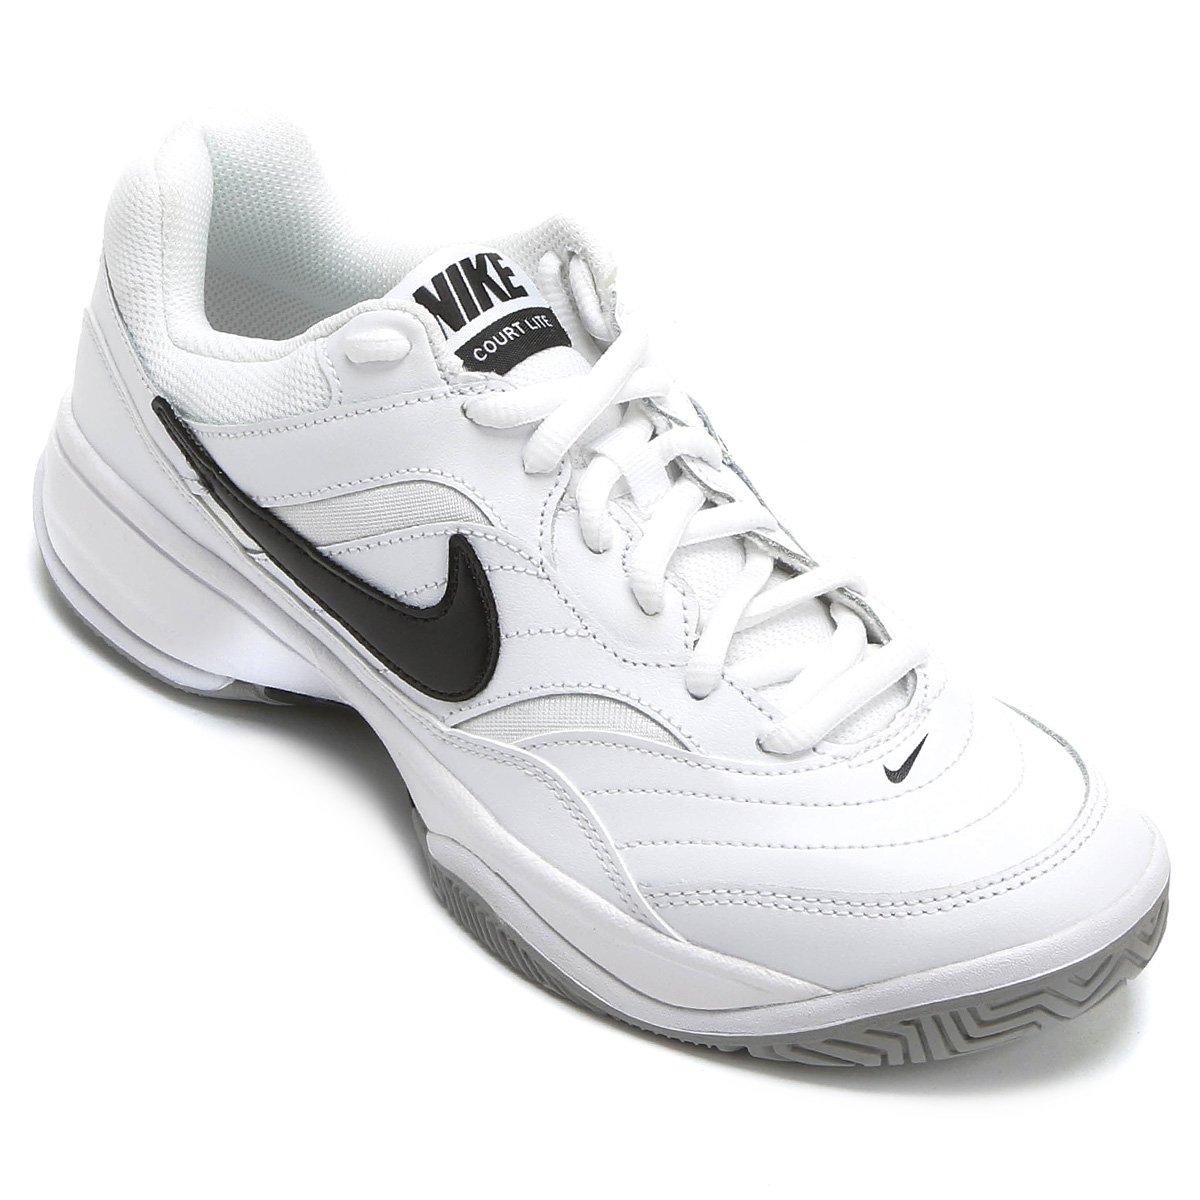 32d3e2d48c8 Tênis Nike Court Lite Masculino - Branco e Preto - Compre Agora ...